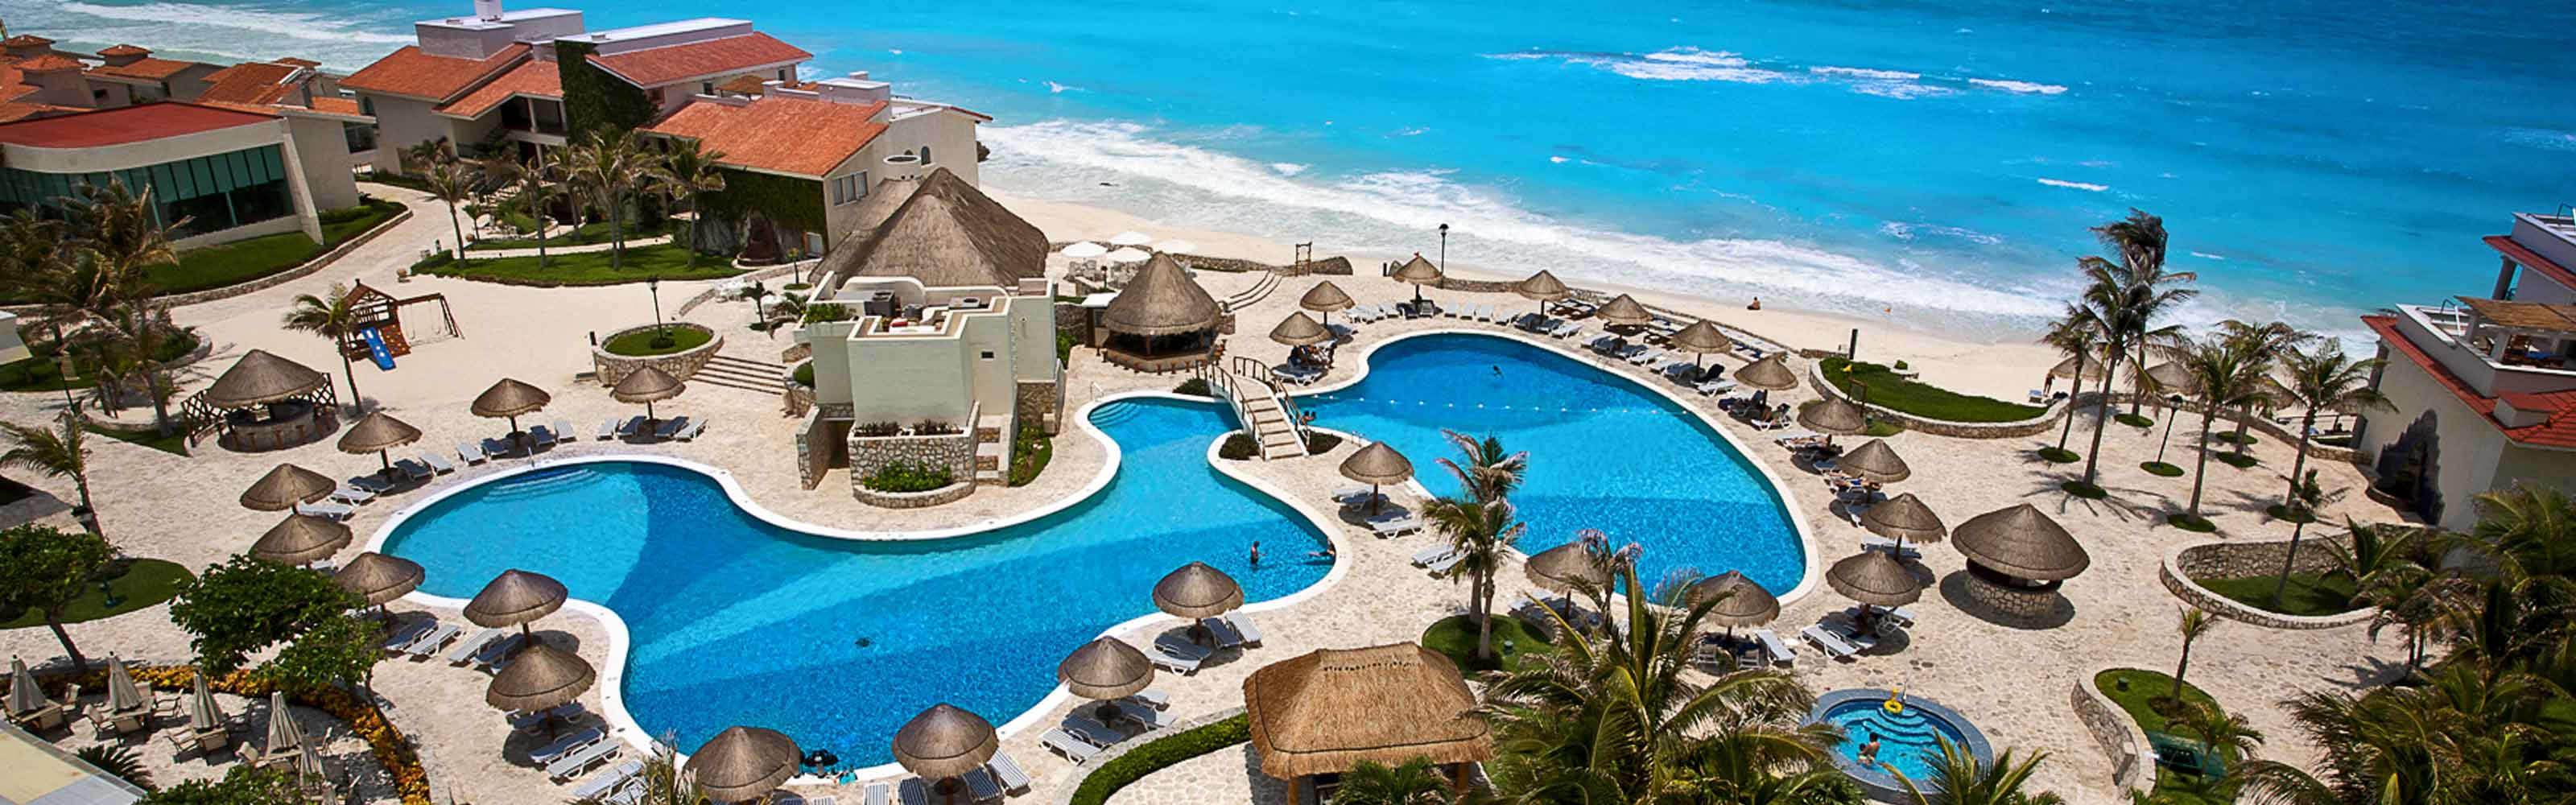 seo title park royal grand cancun